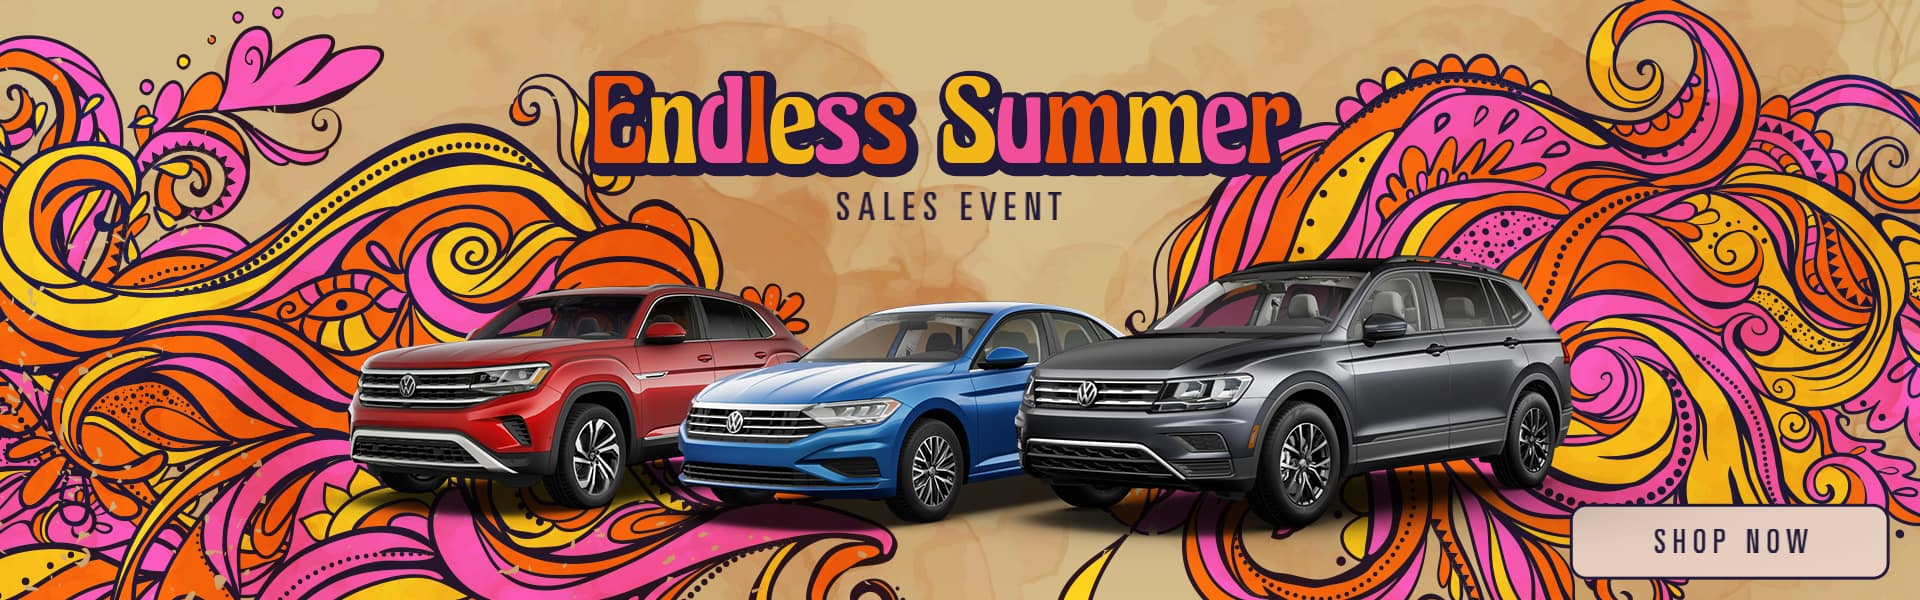 Endless Summer Sales Event